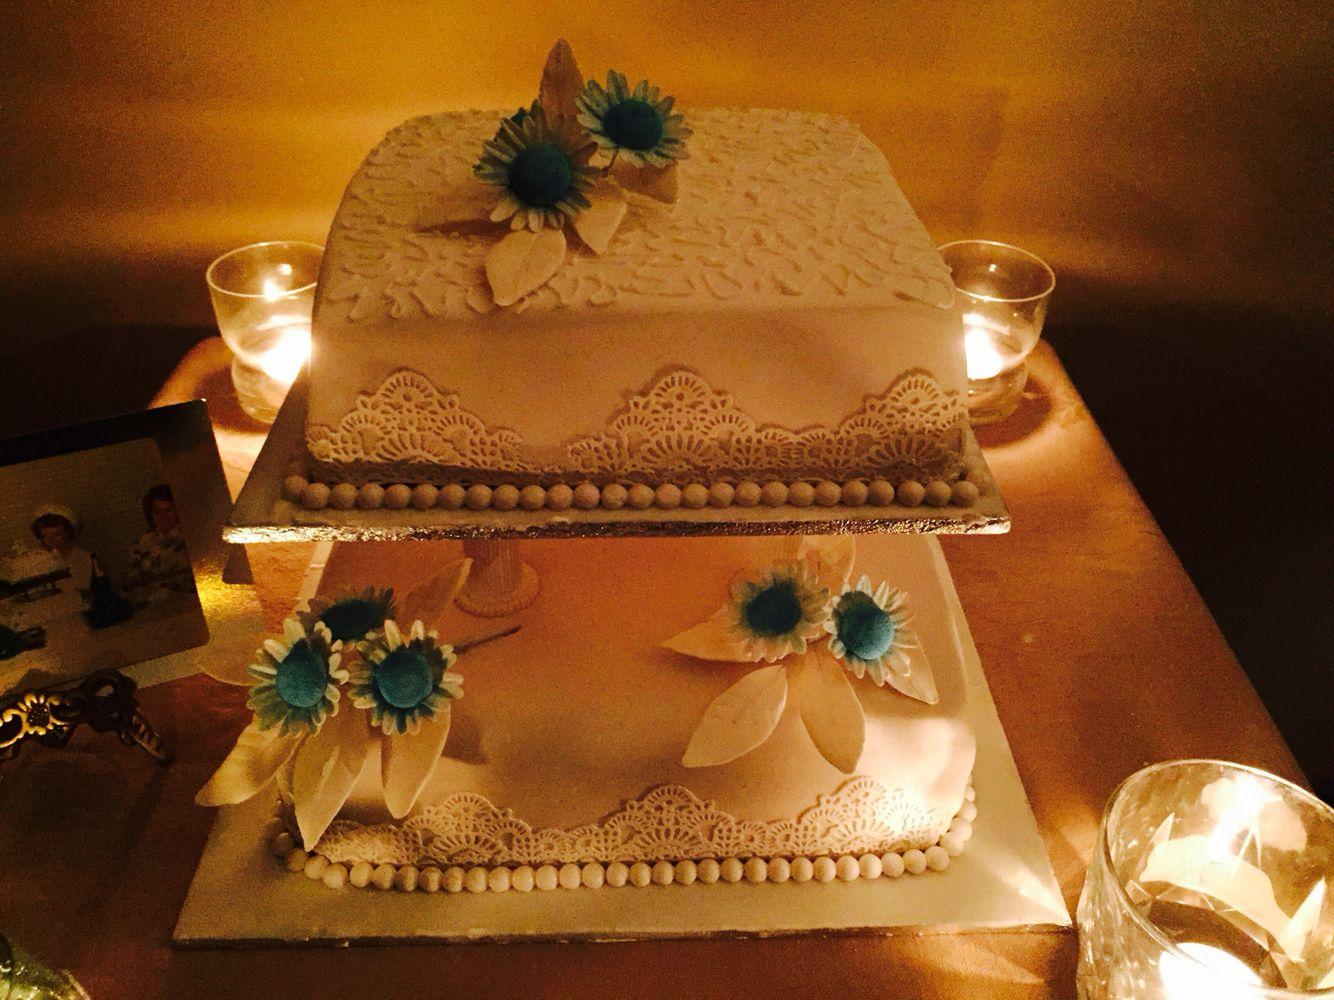 Decoration ideas for 40th wedding anniversary  th Wedding anniversary cake  Wedding Cakes  Pinterest  th